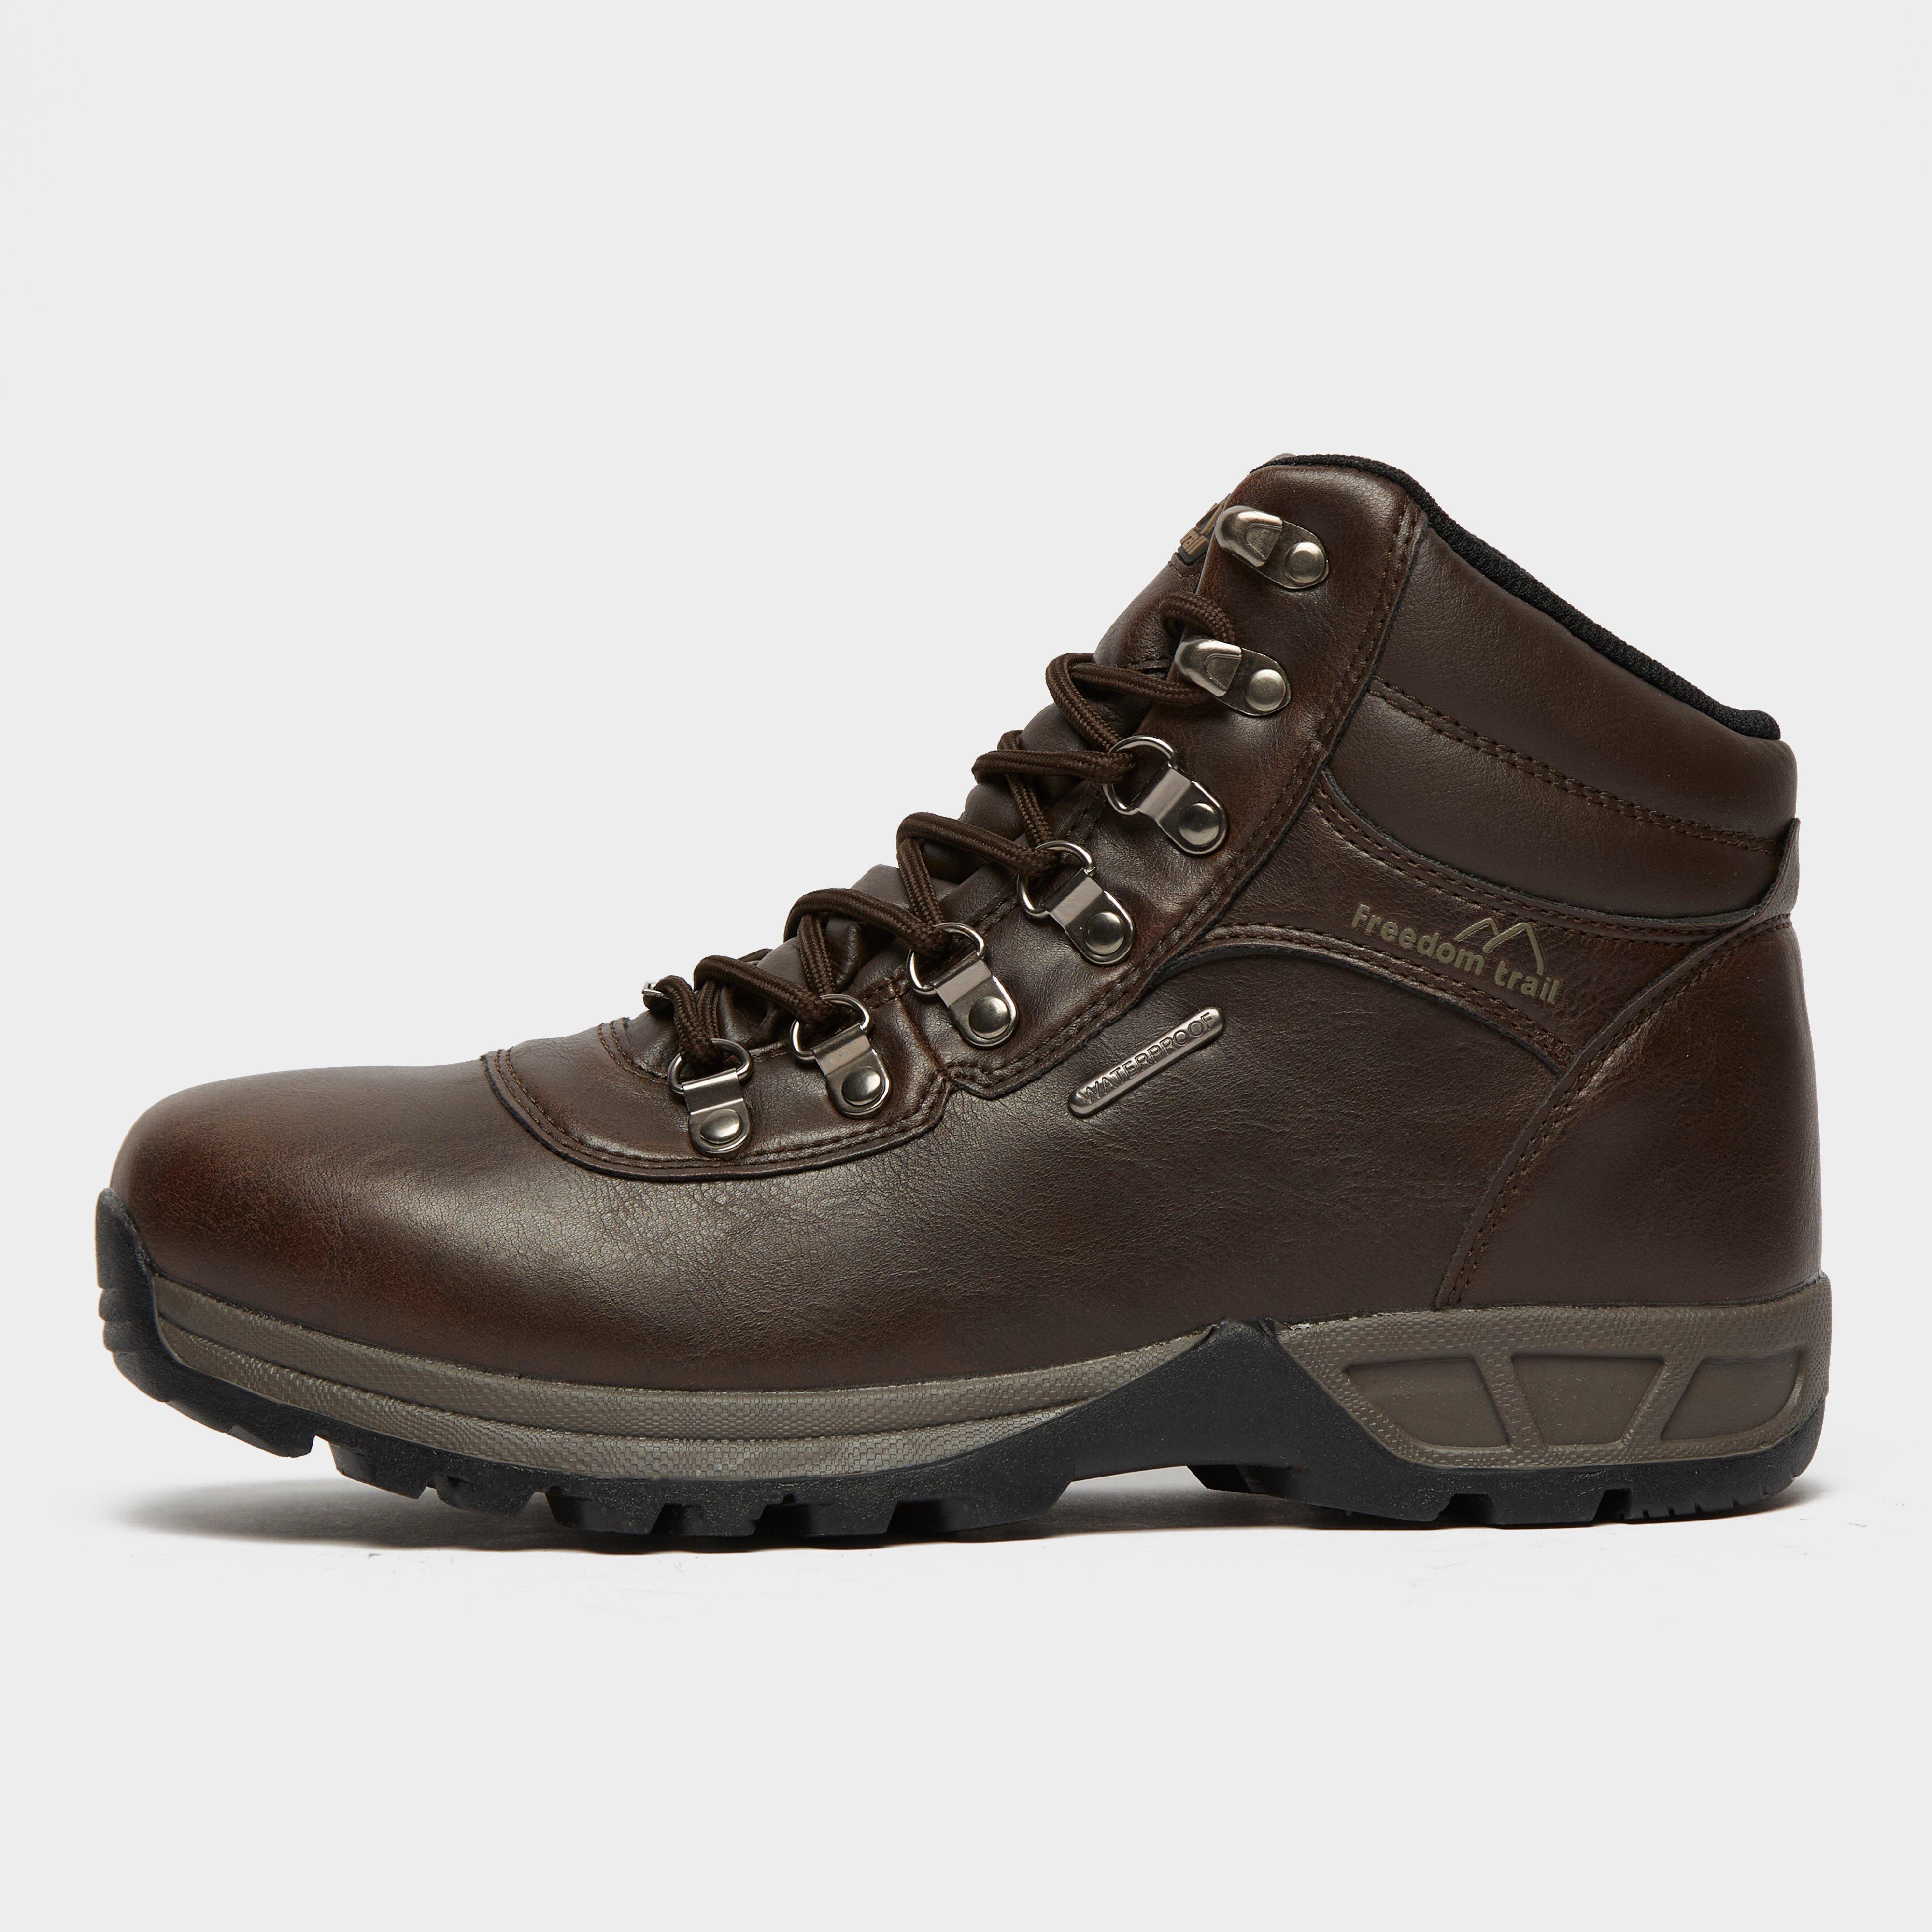 Freedomtrail Women's Rivelin Walking Boots - Brown, Brown